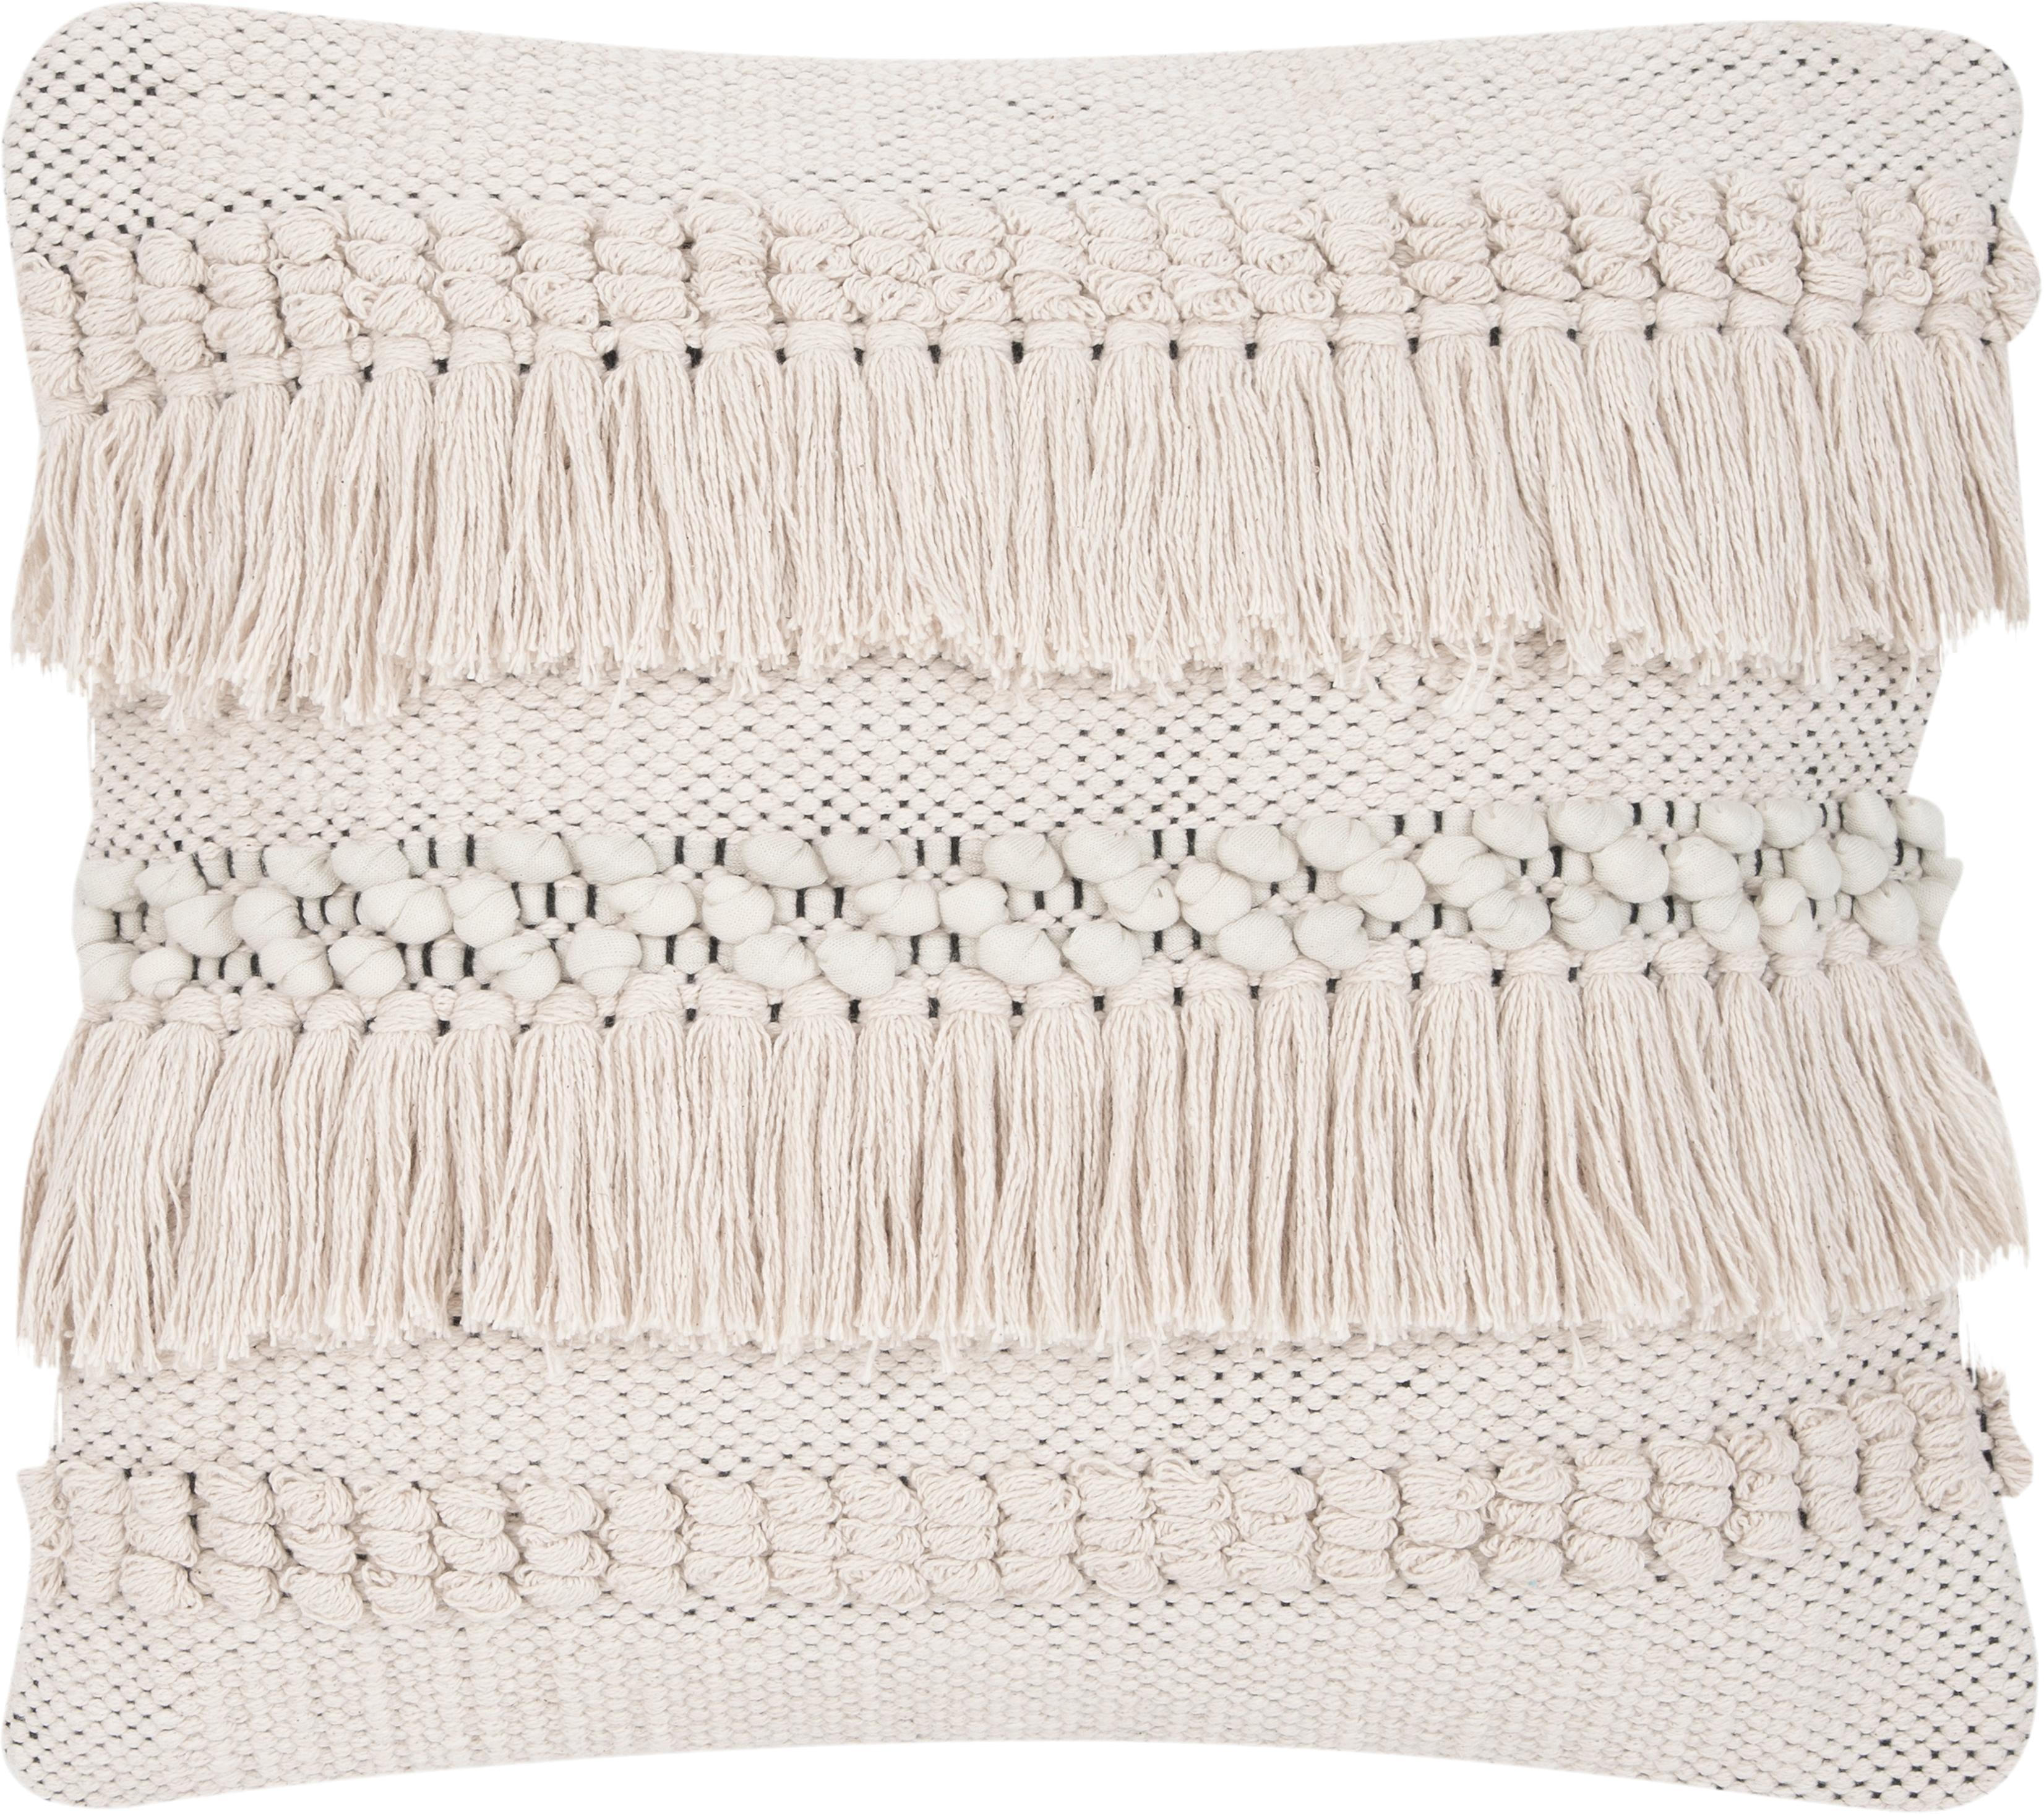 Boho Kissenhülle Kele in Ecru, 97% Baumwolle, 3% Polyester, Ecru, Schwarz, 40 x 40 cm